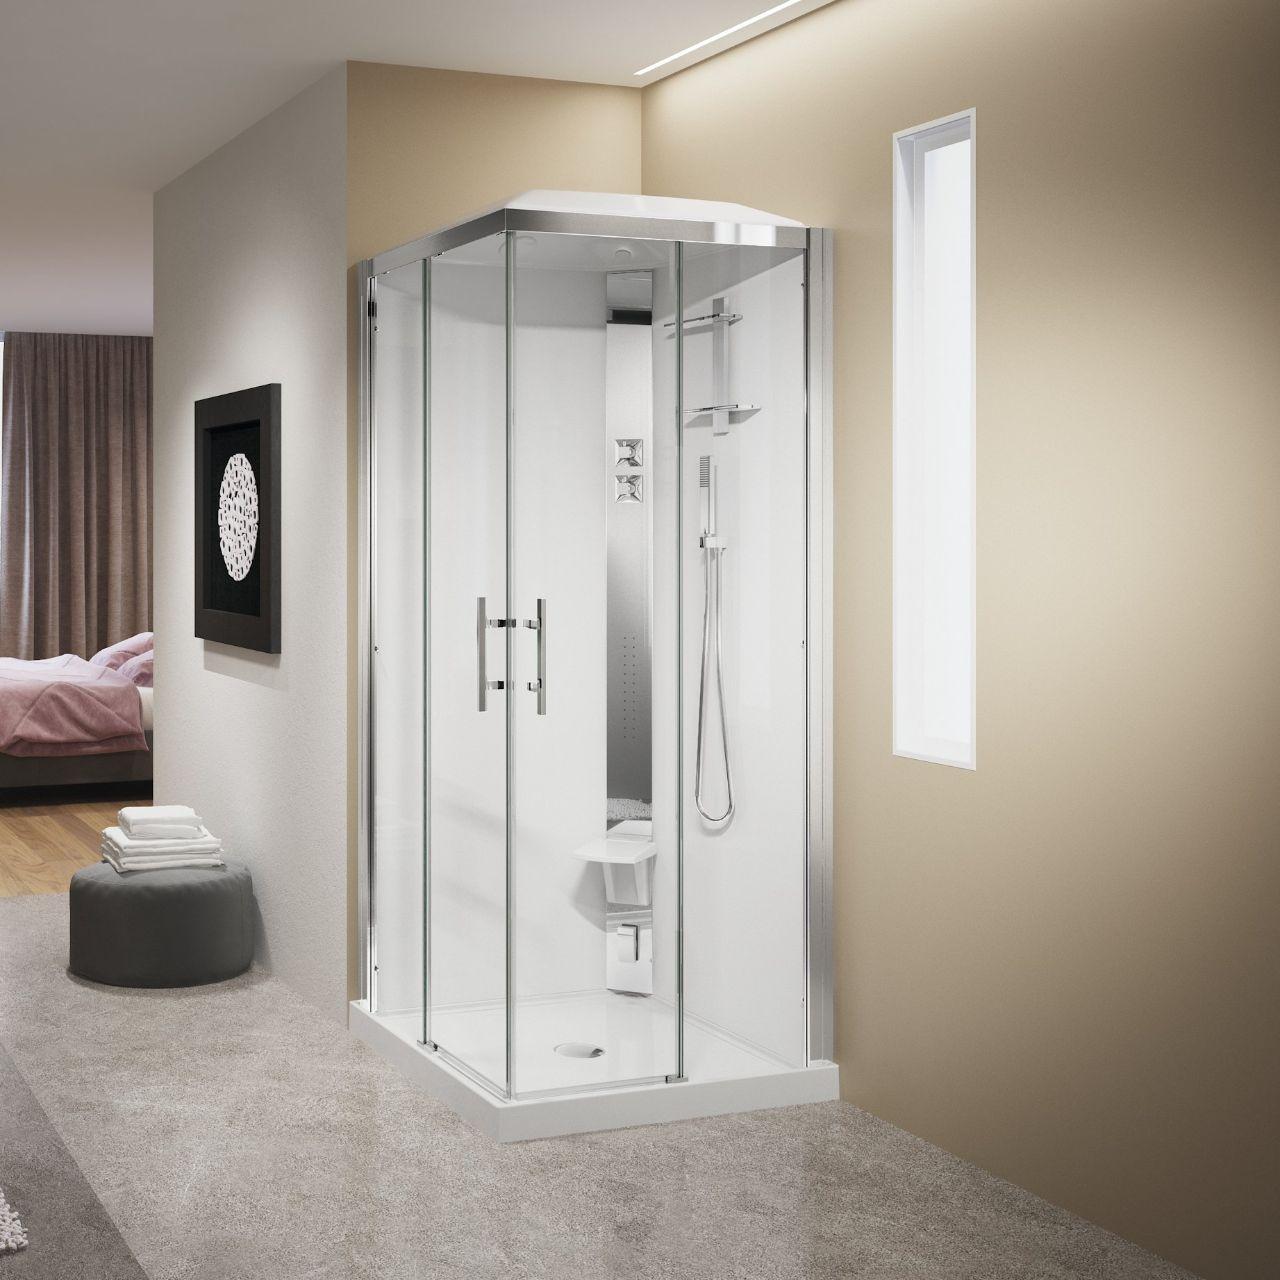 cabines de douche crystal a90 novellini. Black Bedroom Furniture Sets. Home Design Ideas